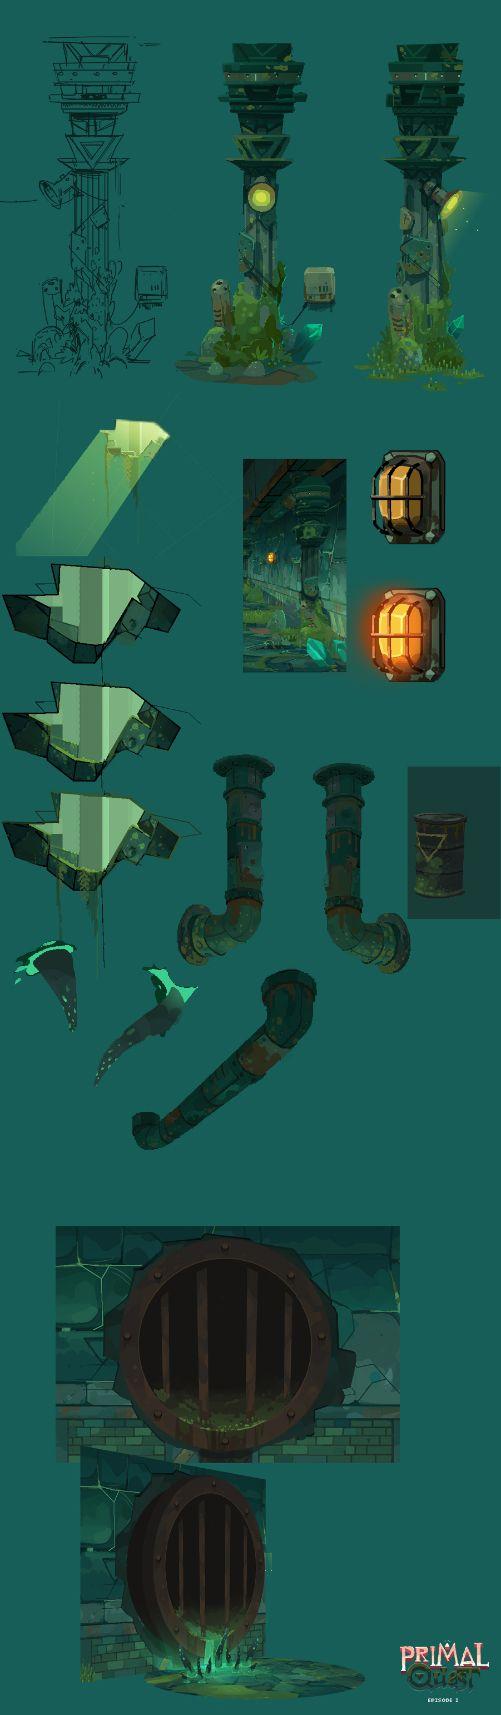 2# Primal Quest//Final art. on Behance